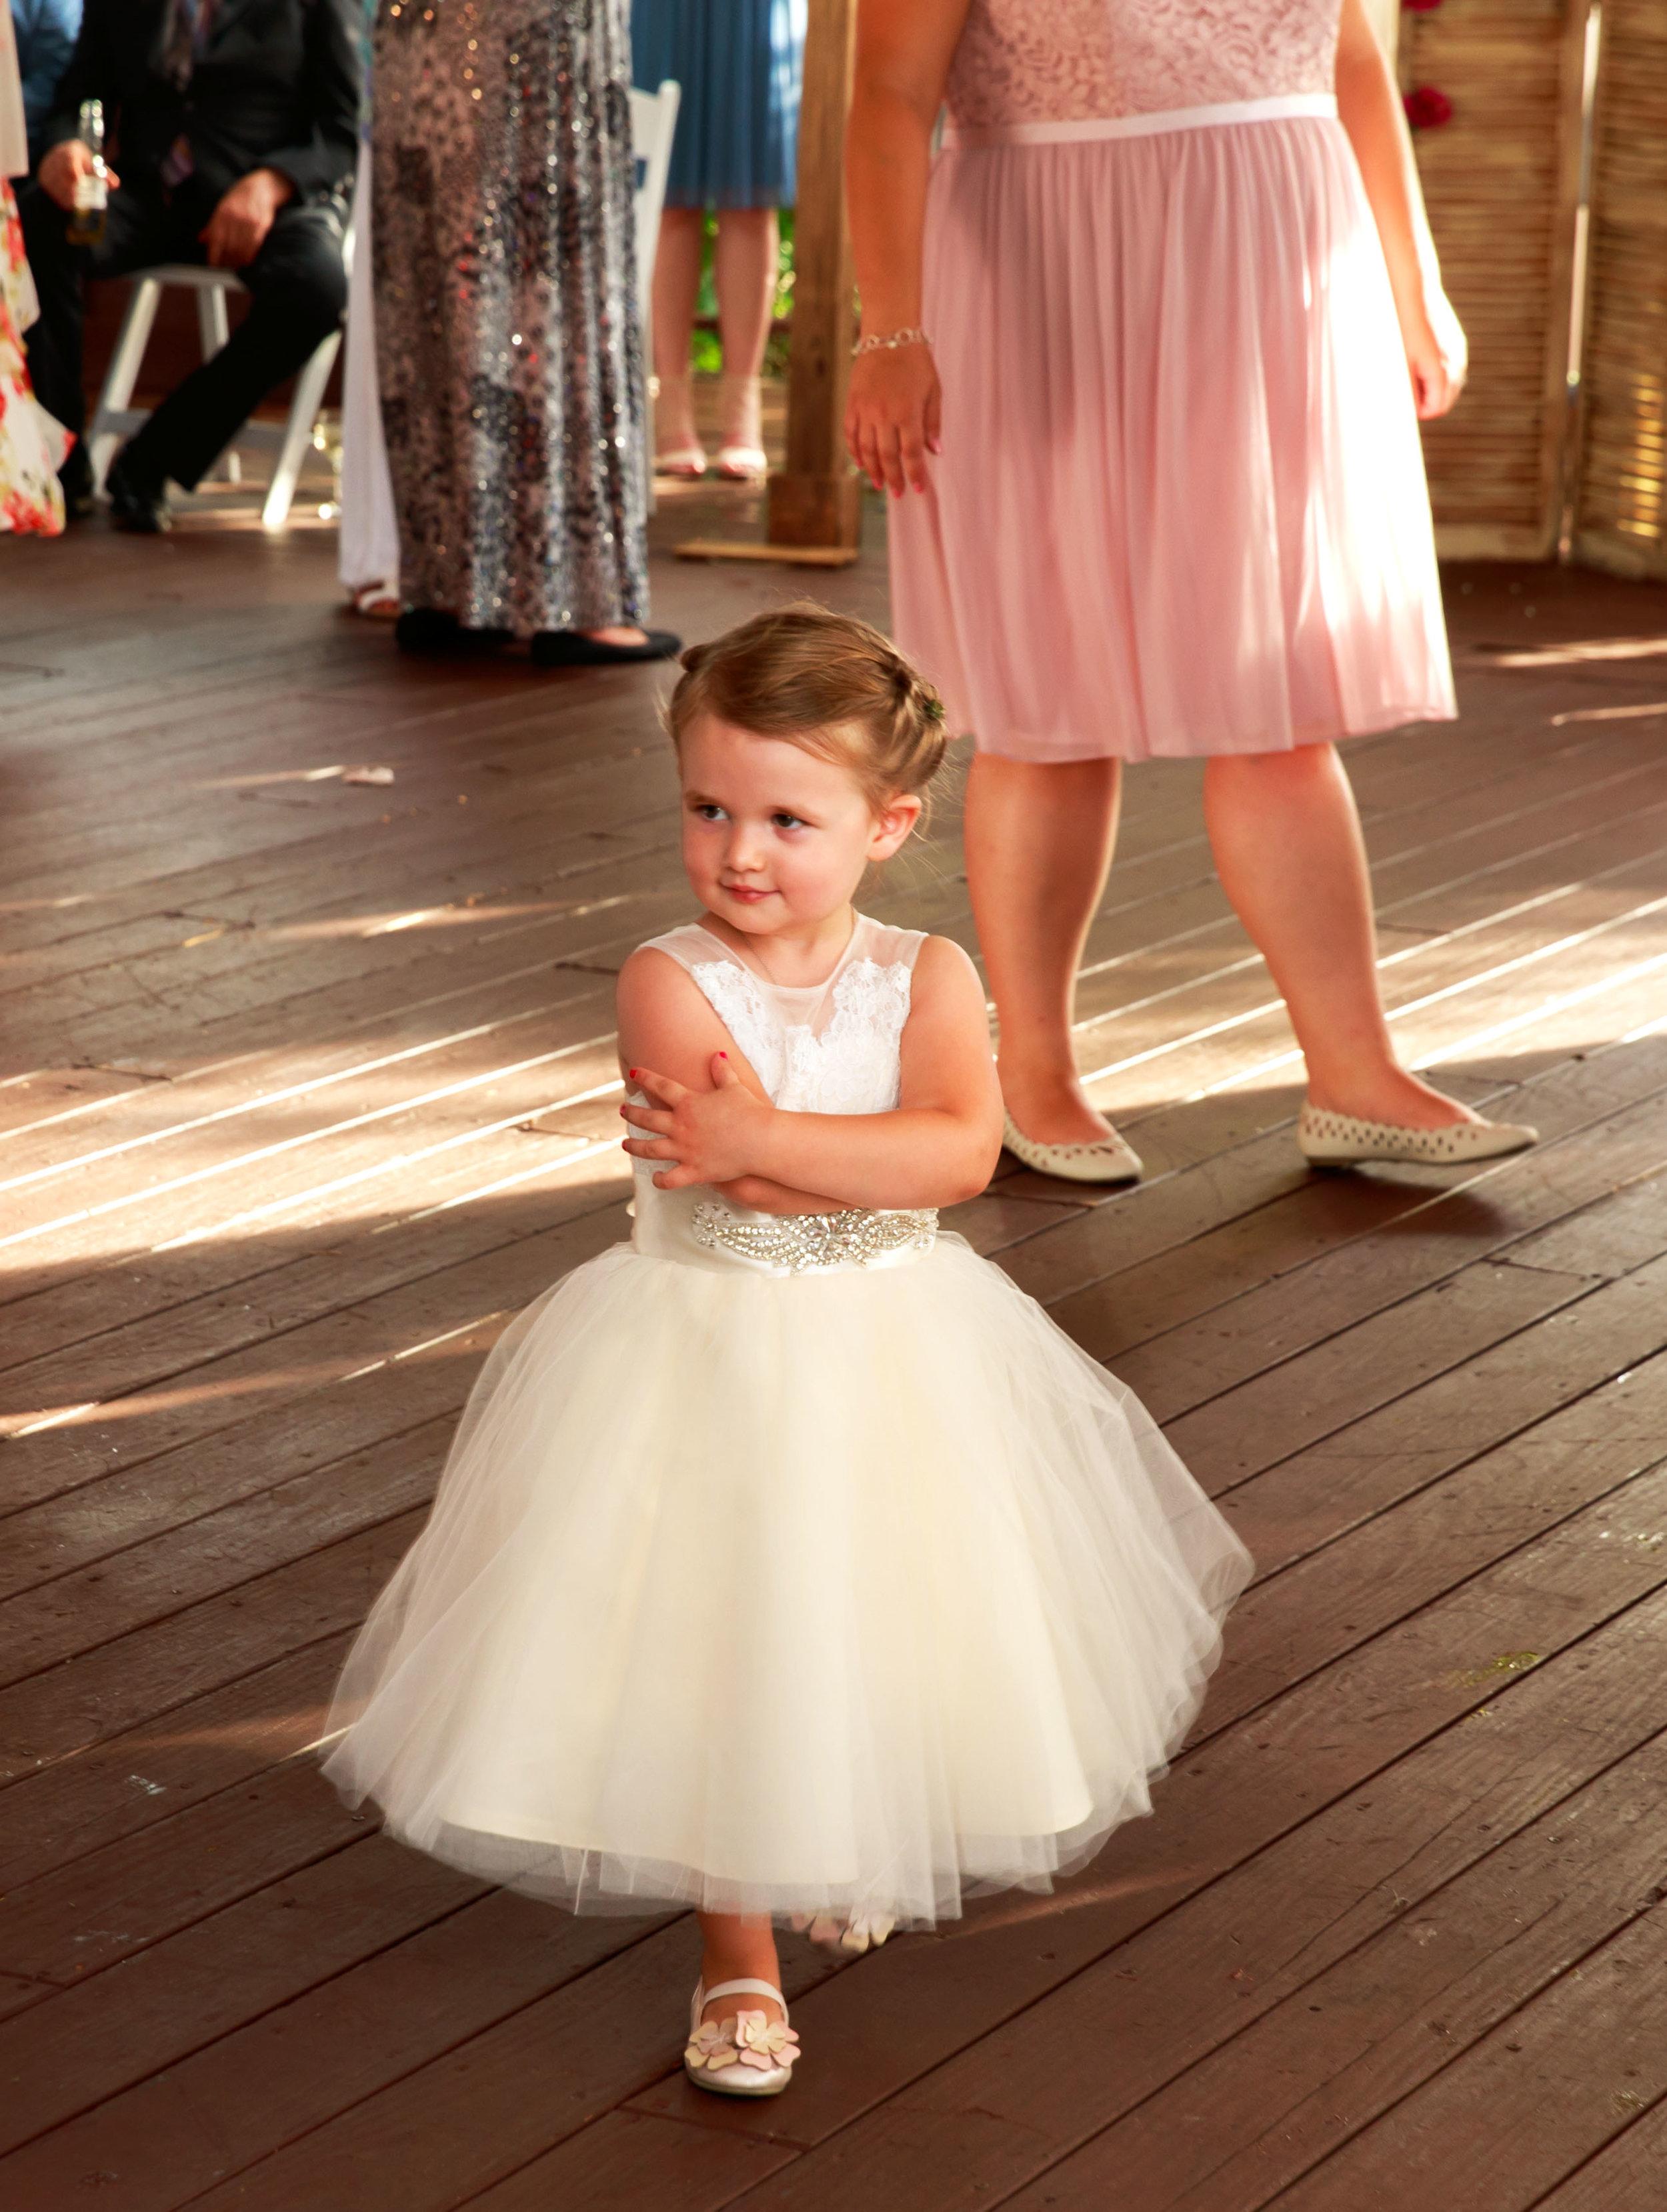 128-South-Wedding-Wilmington-NC-Photographer-Reception-23.jpg